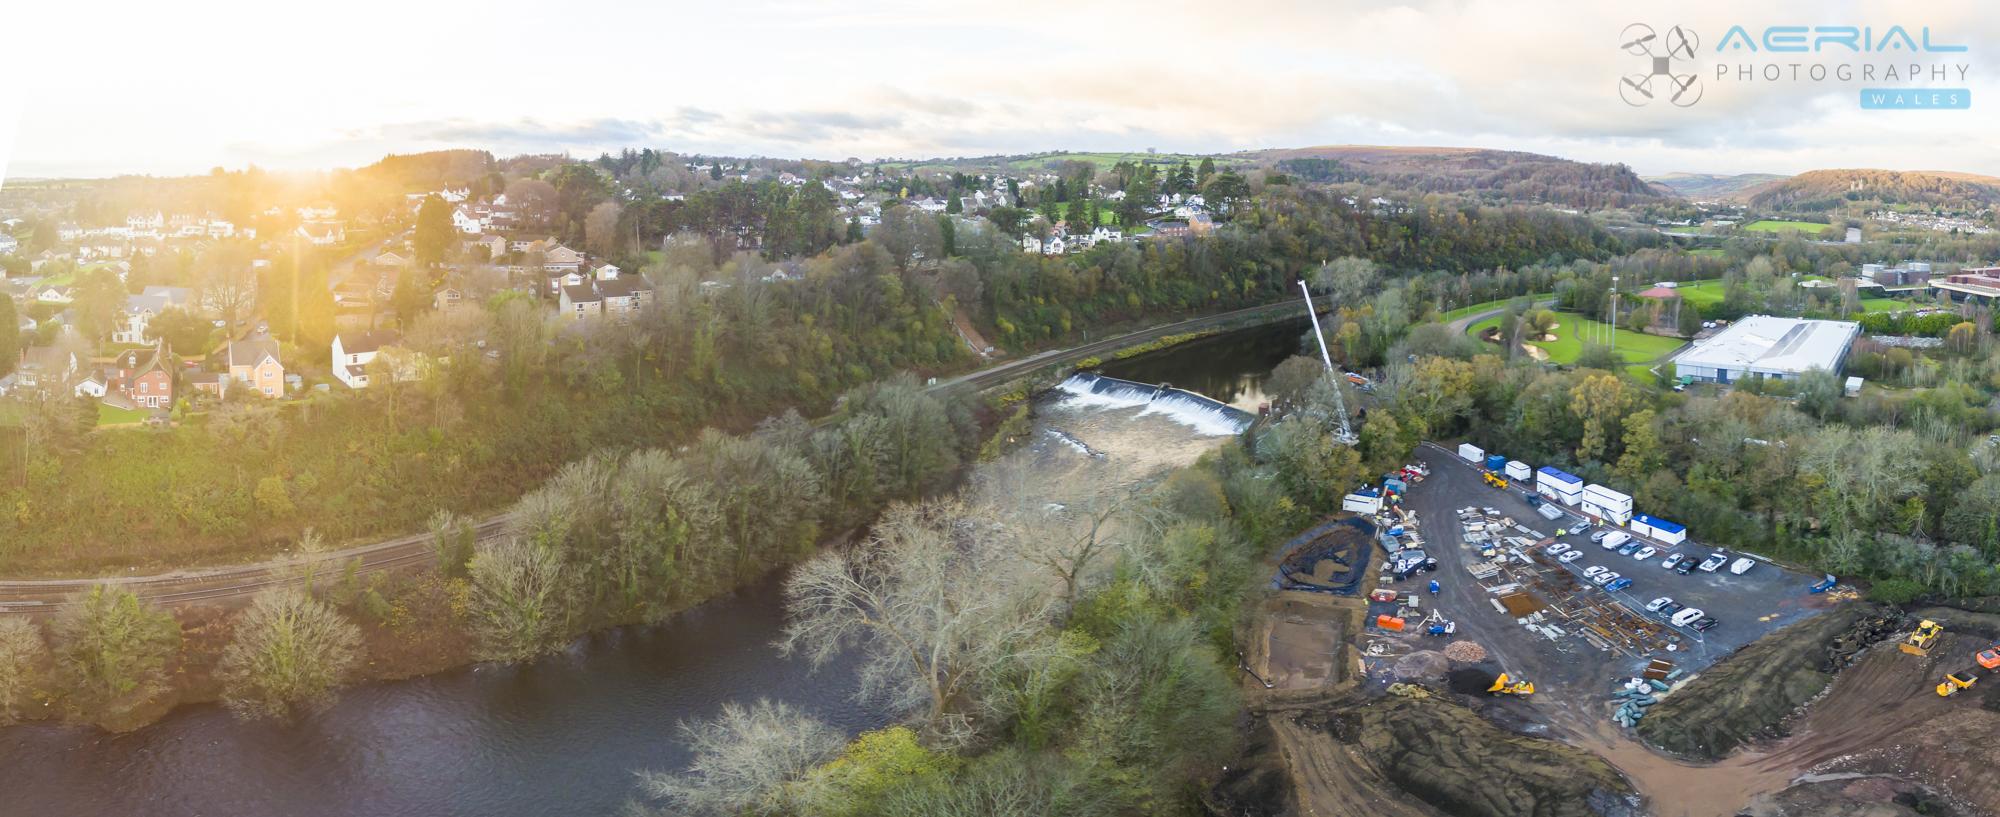 Radyr Weir Hydro Scheme-127